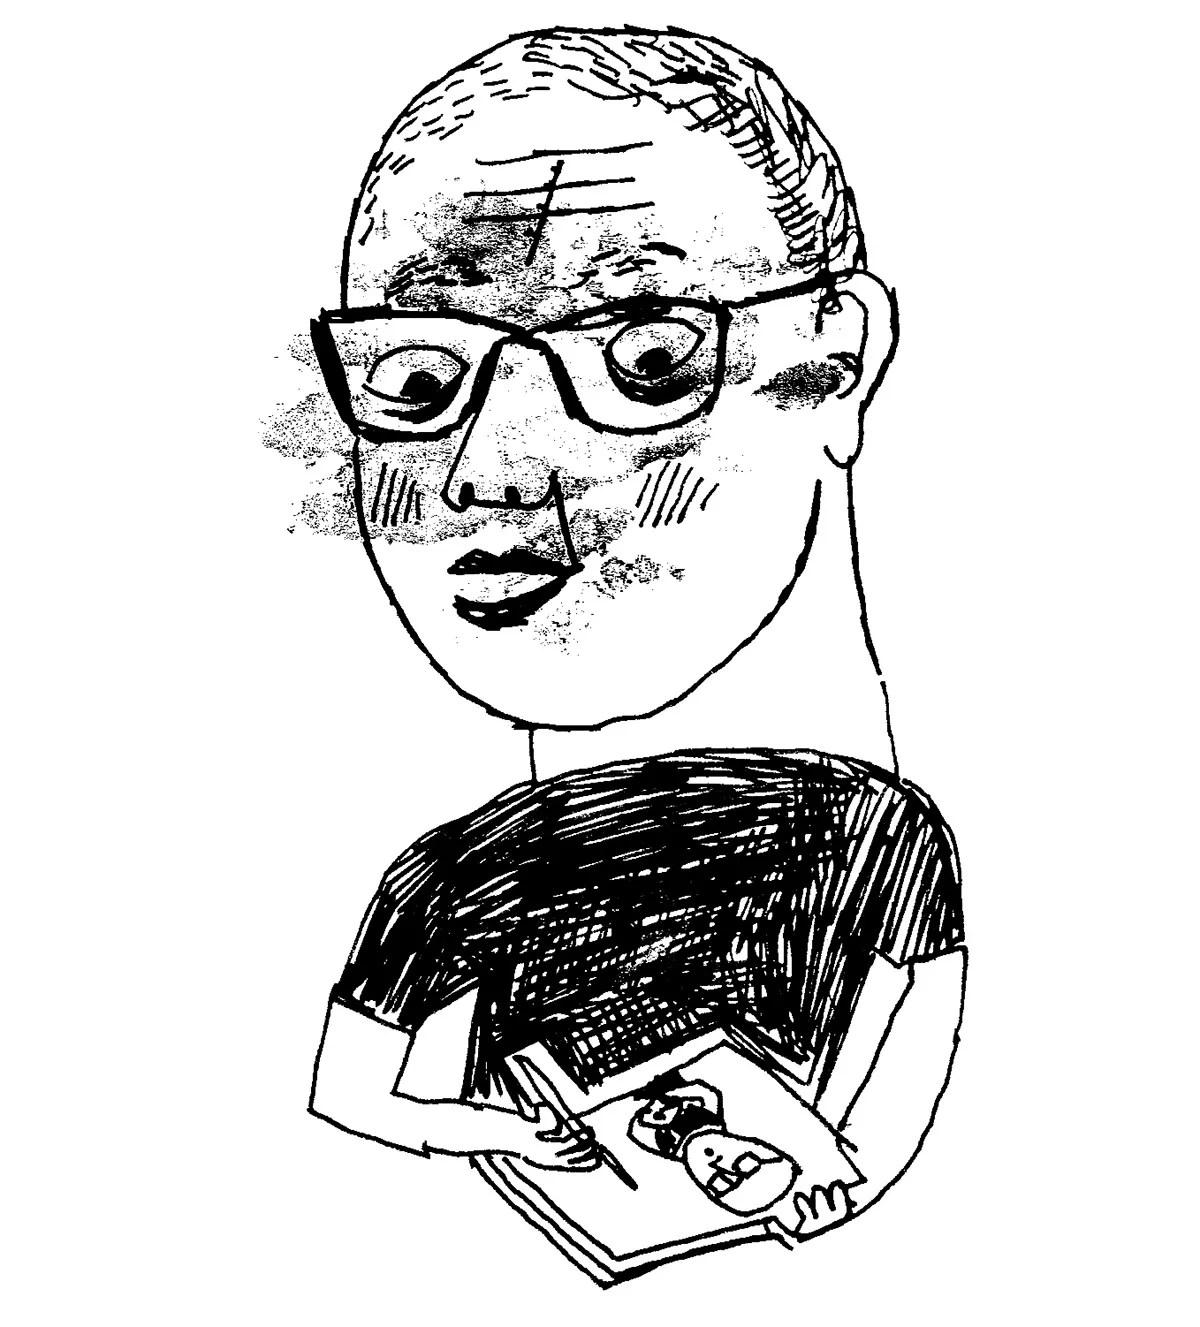 Meet An Illustrator 24 – John Broadley